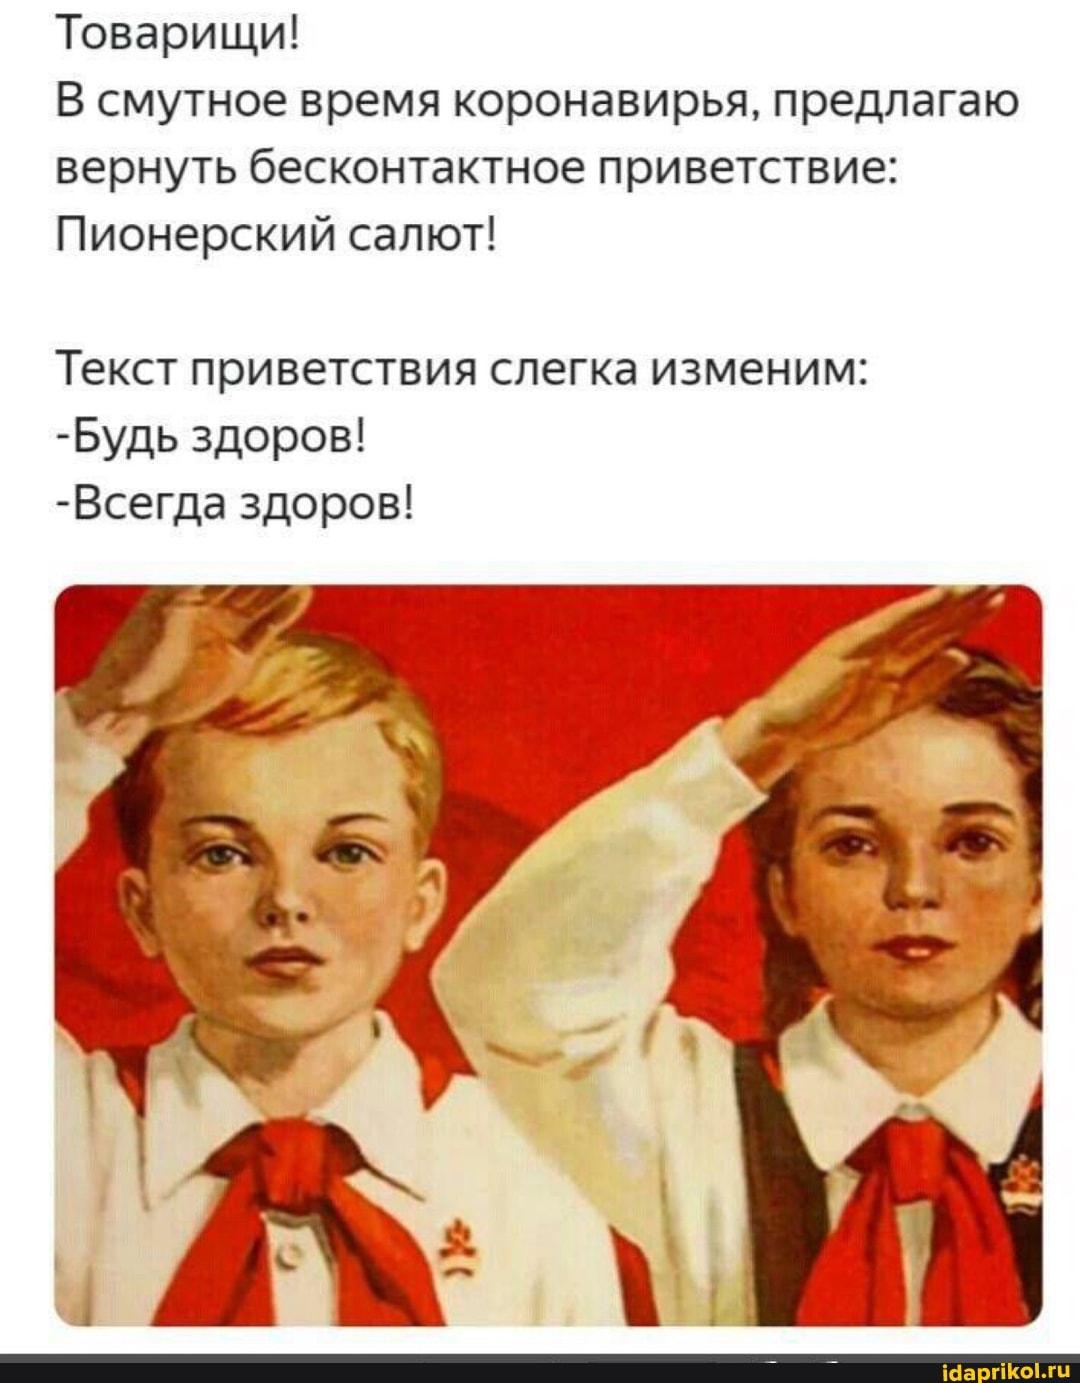 https://cdn.idaprikol.ru/images/534cde1090e40b607d4b983bb45672afc56edc2ba7e2d3167644df6fb381887e_1.jpg